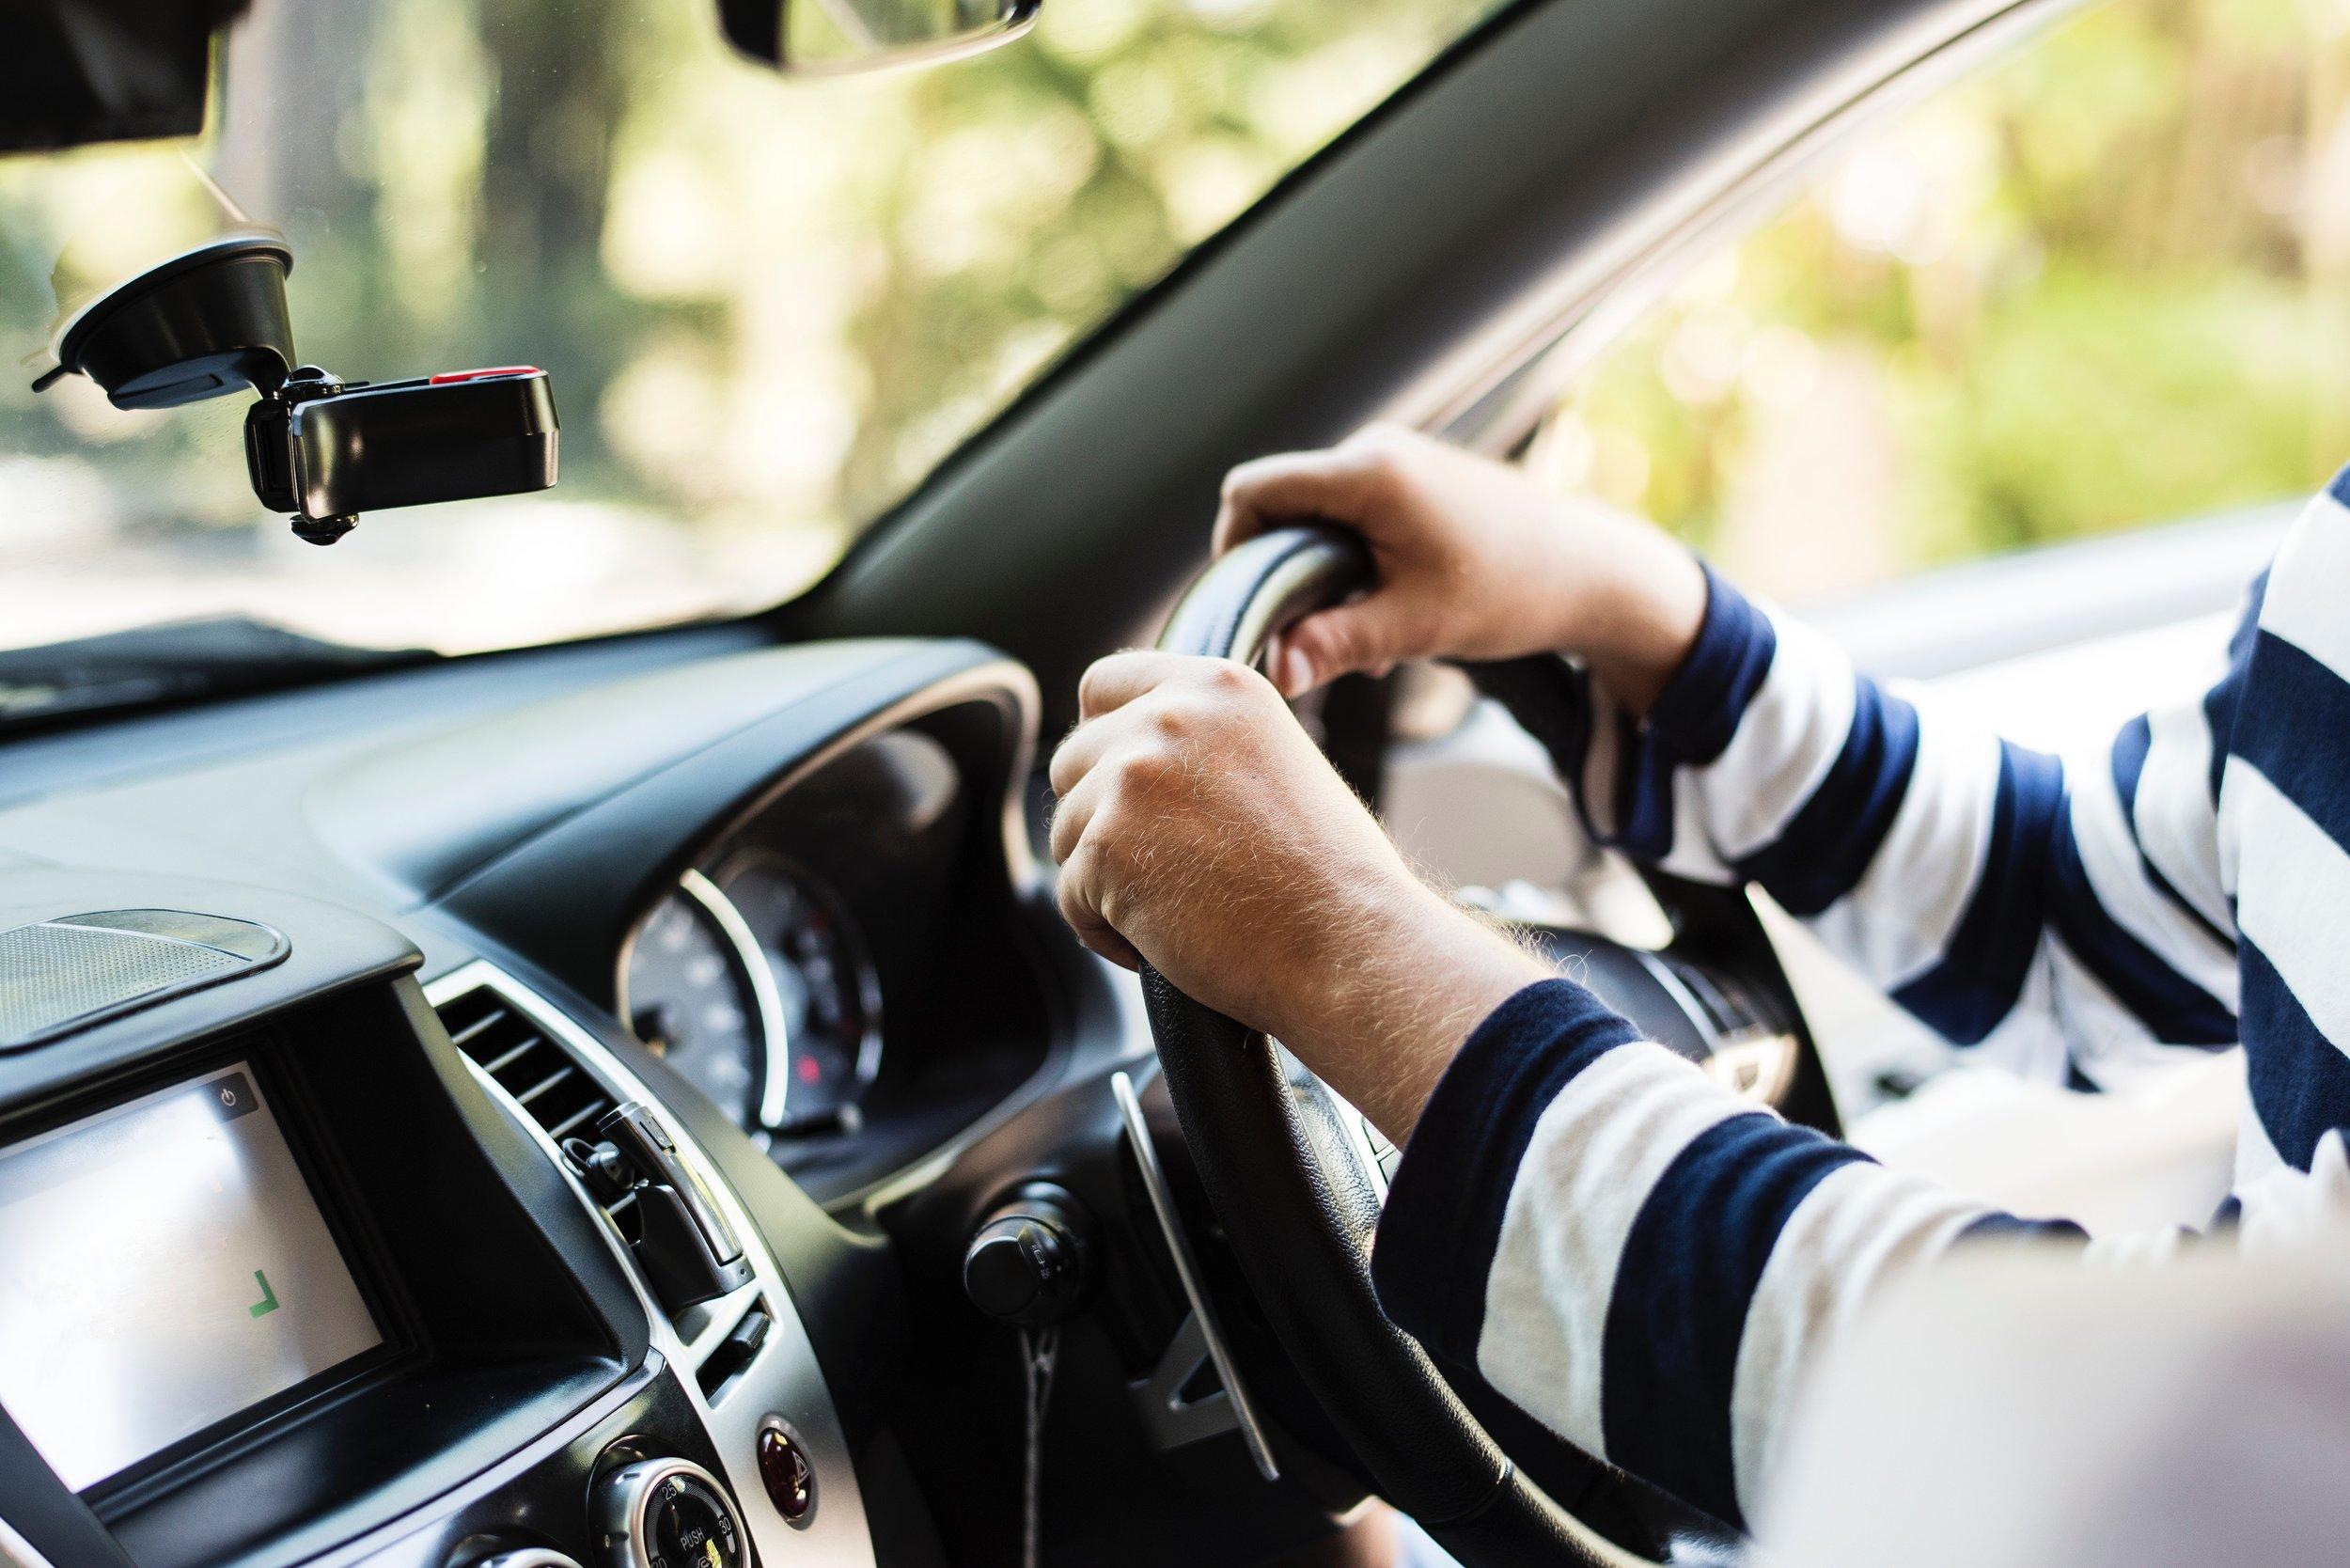 automobile-blurred-background-car-1426703.jpg